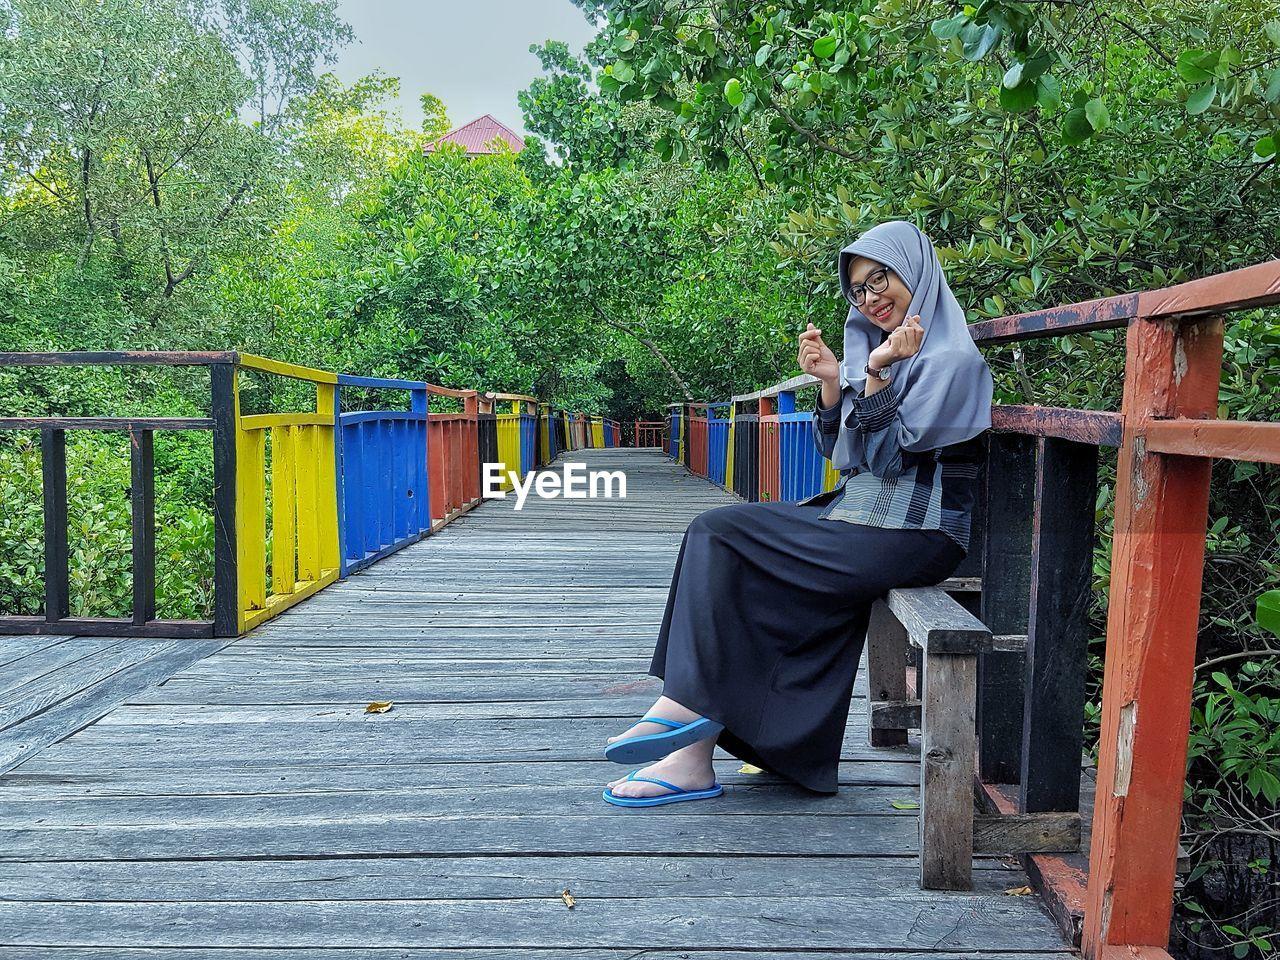 Portrait of smiling woman sitting on footbridge against trees